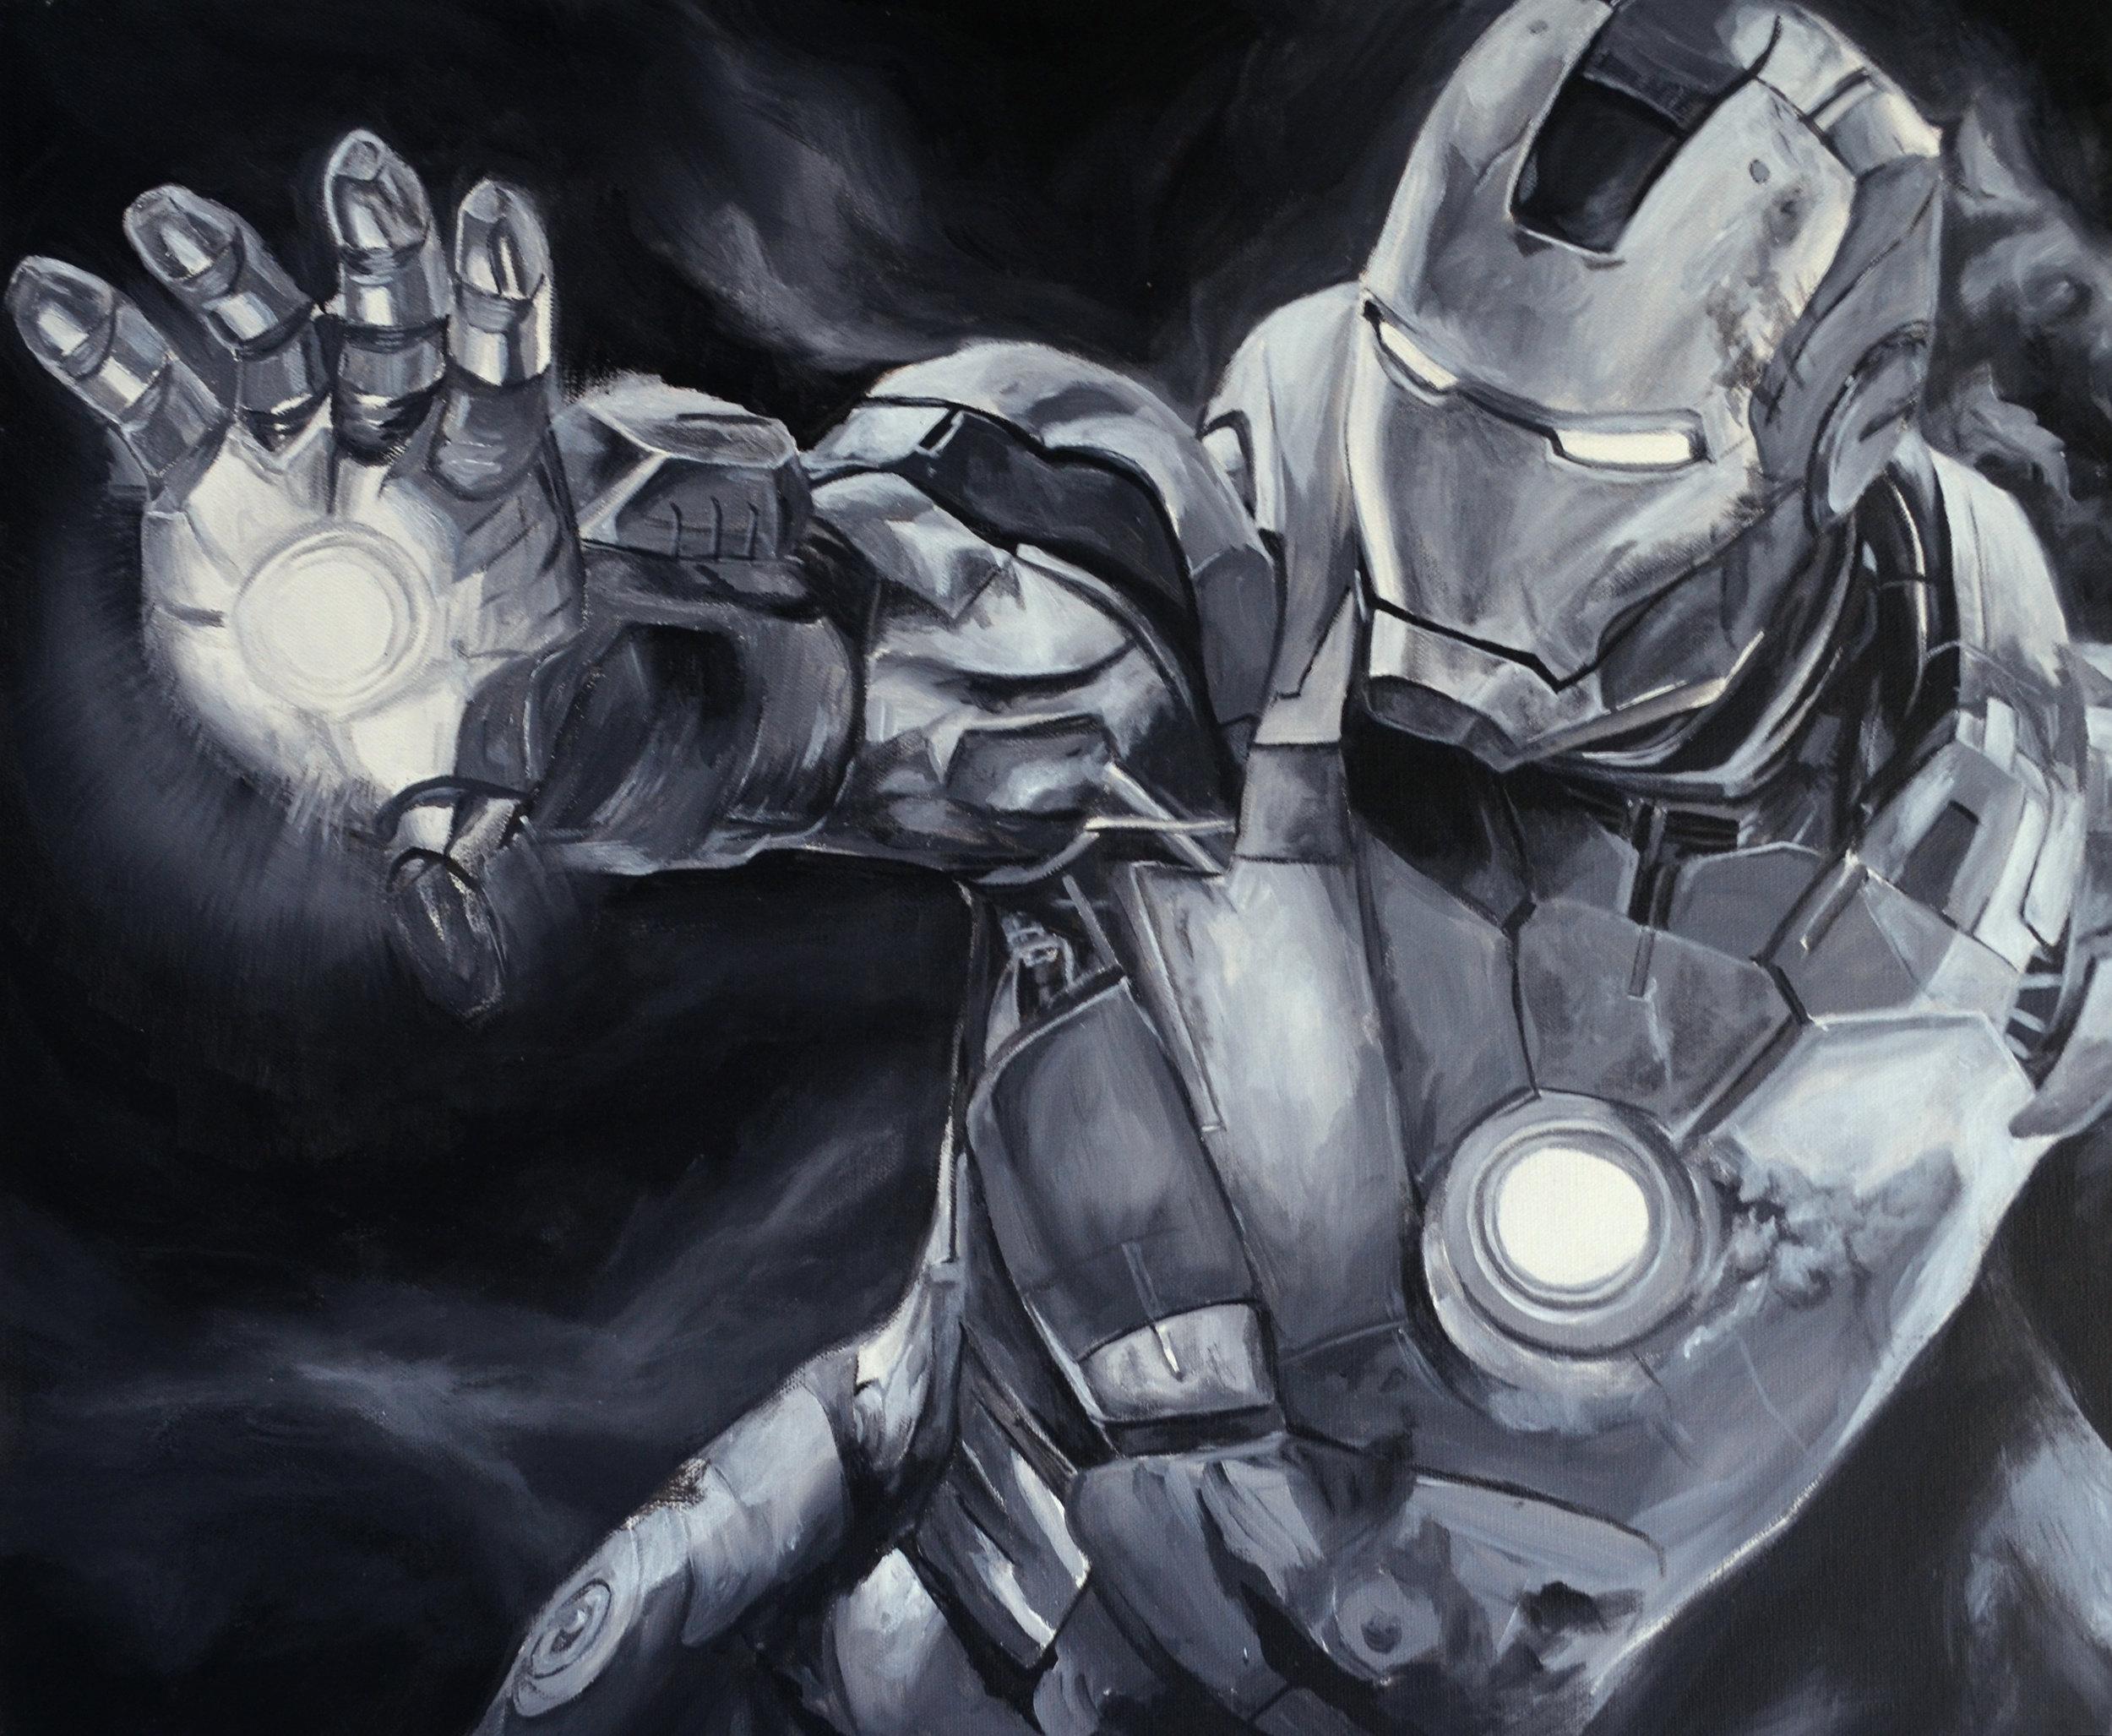 Iron Man - Avengers Series